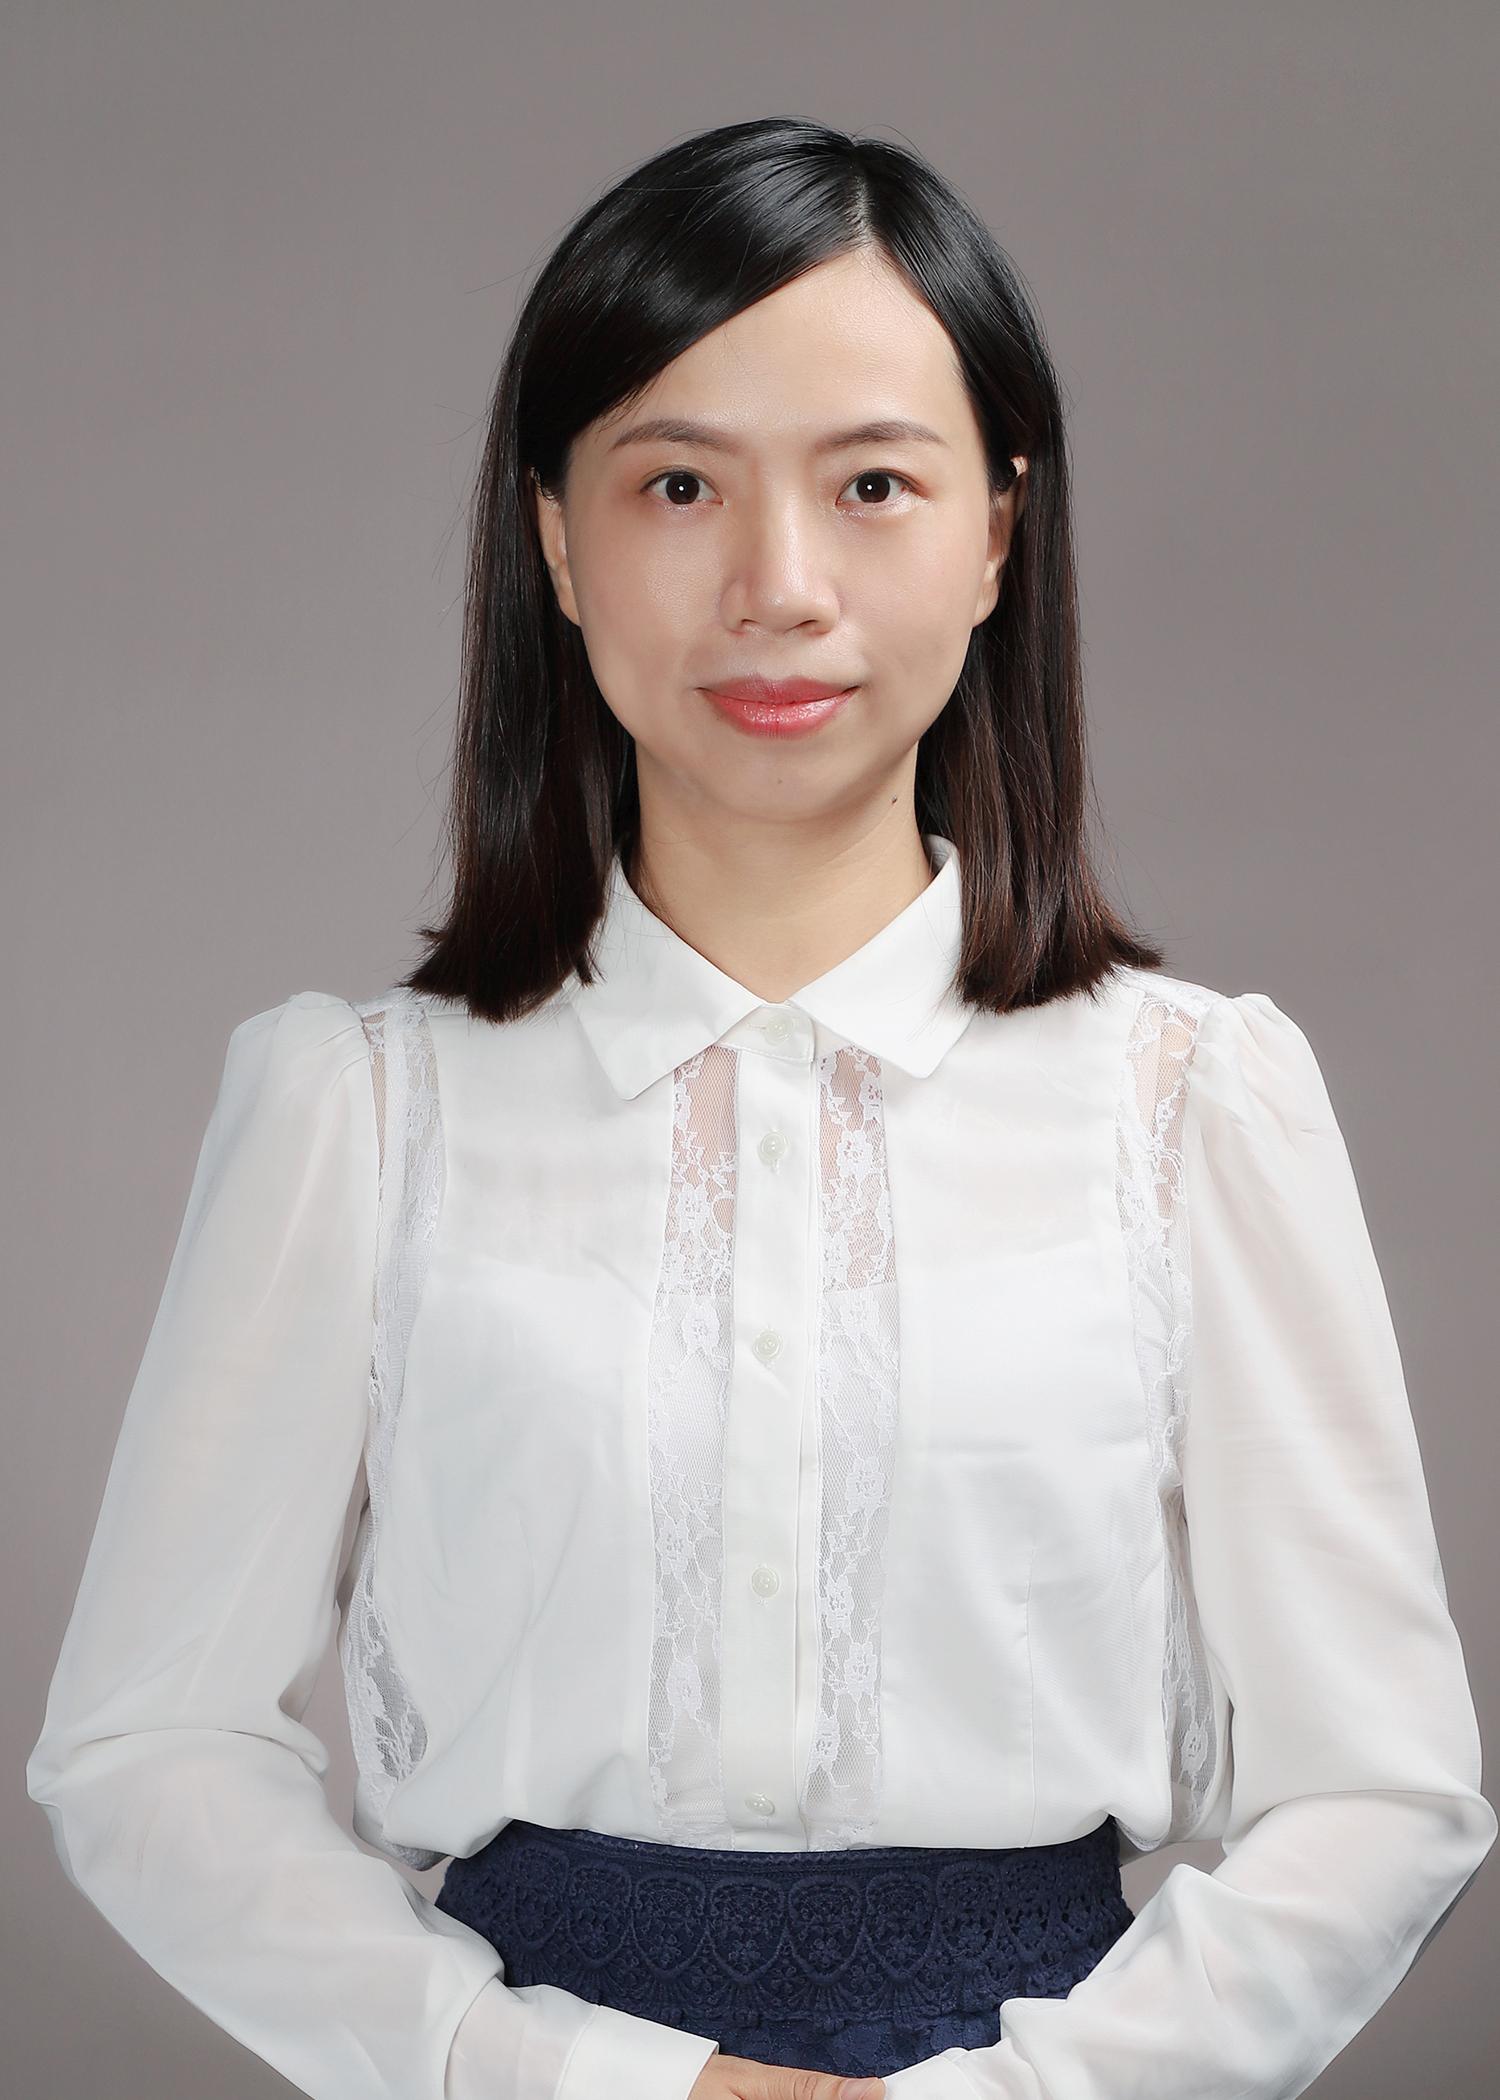 Linghui He(Linda)